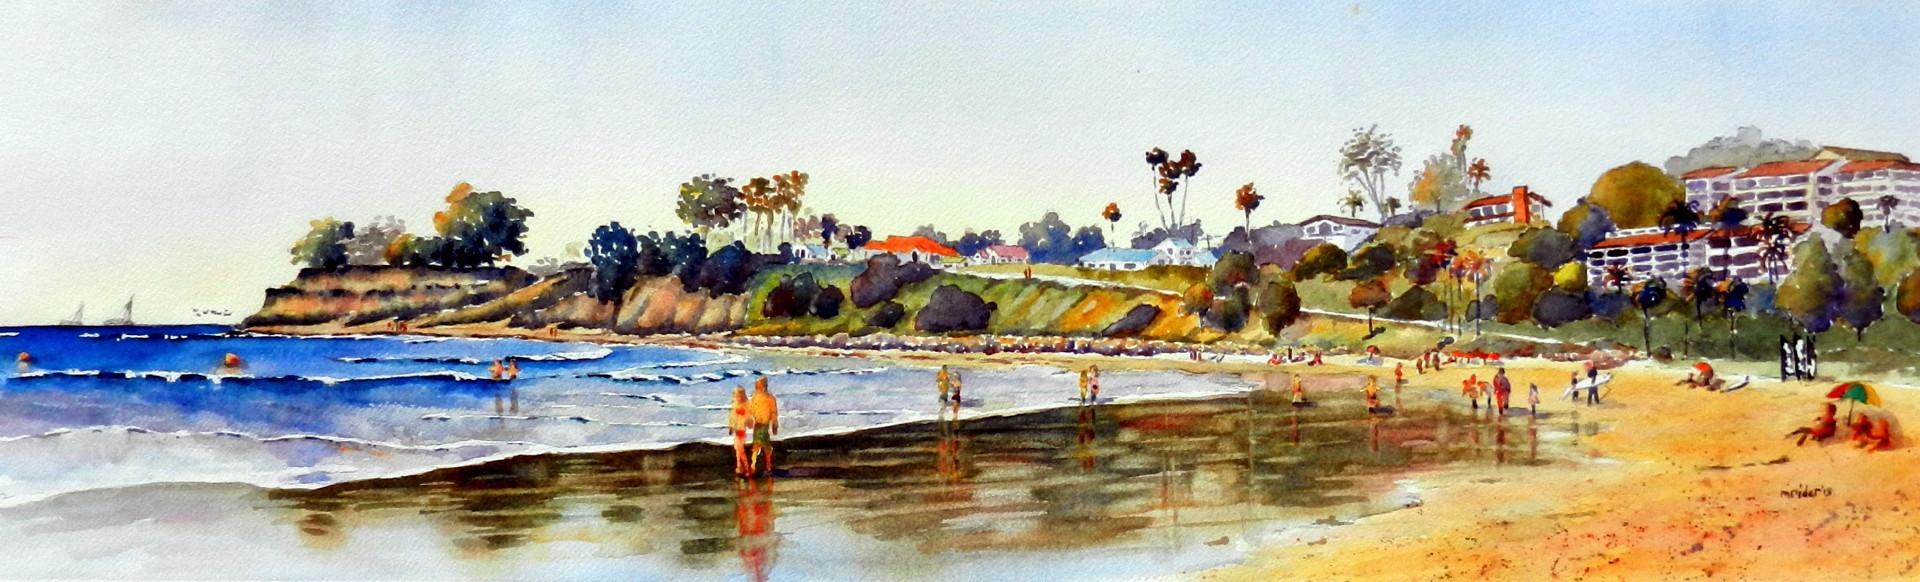 Ledbetter Beach